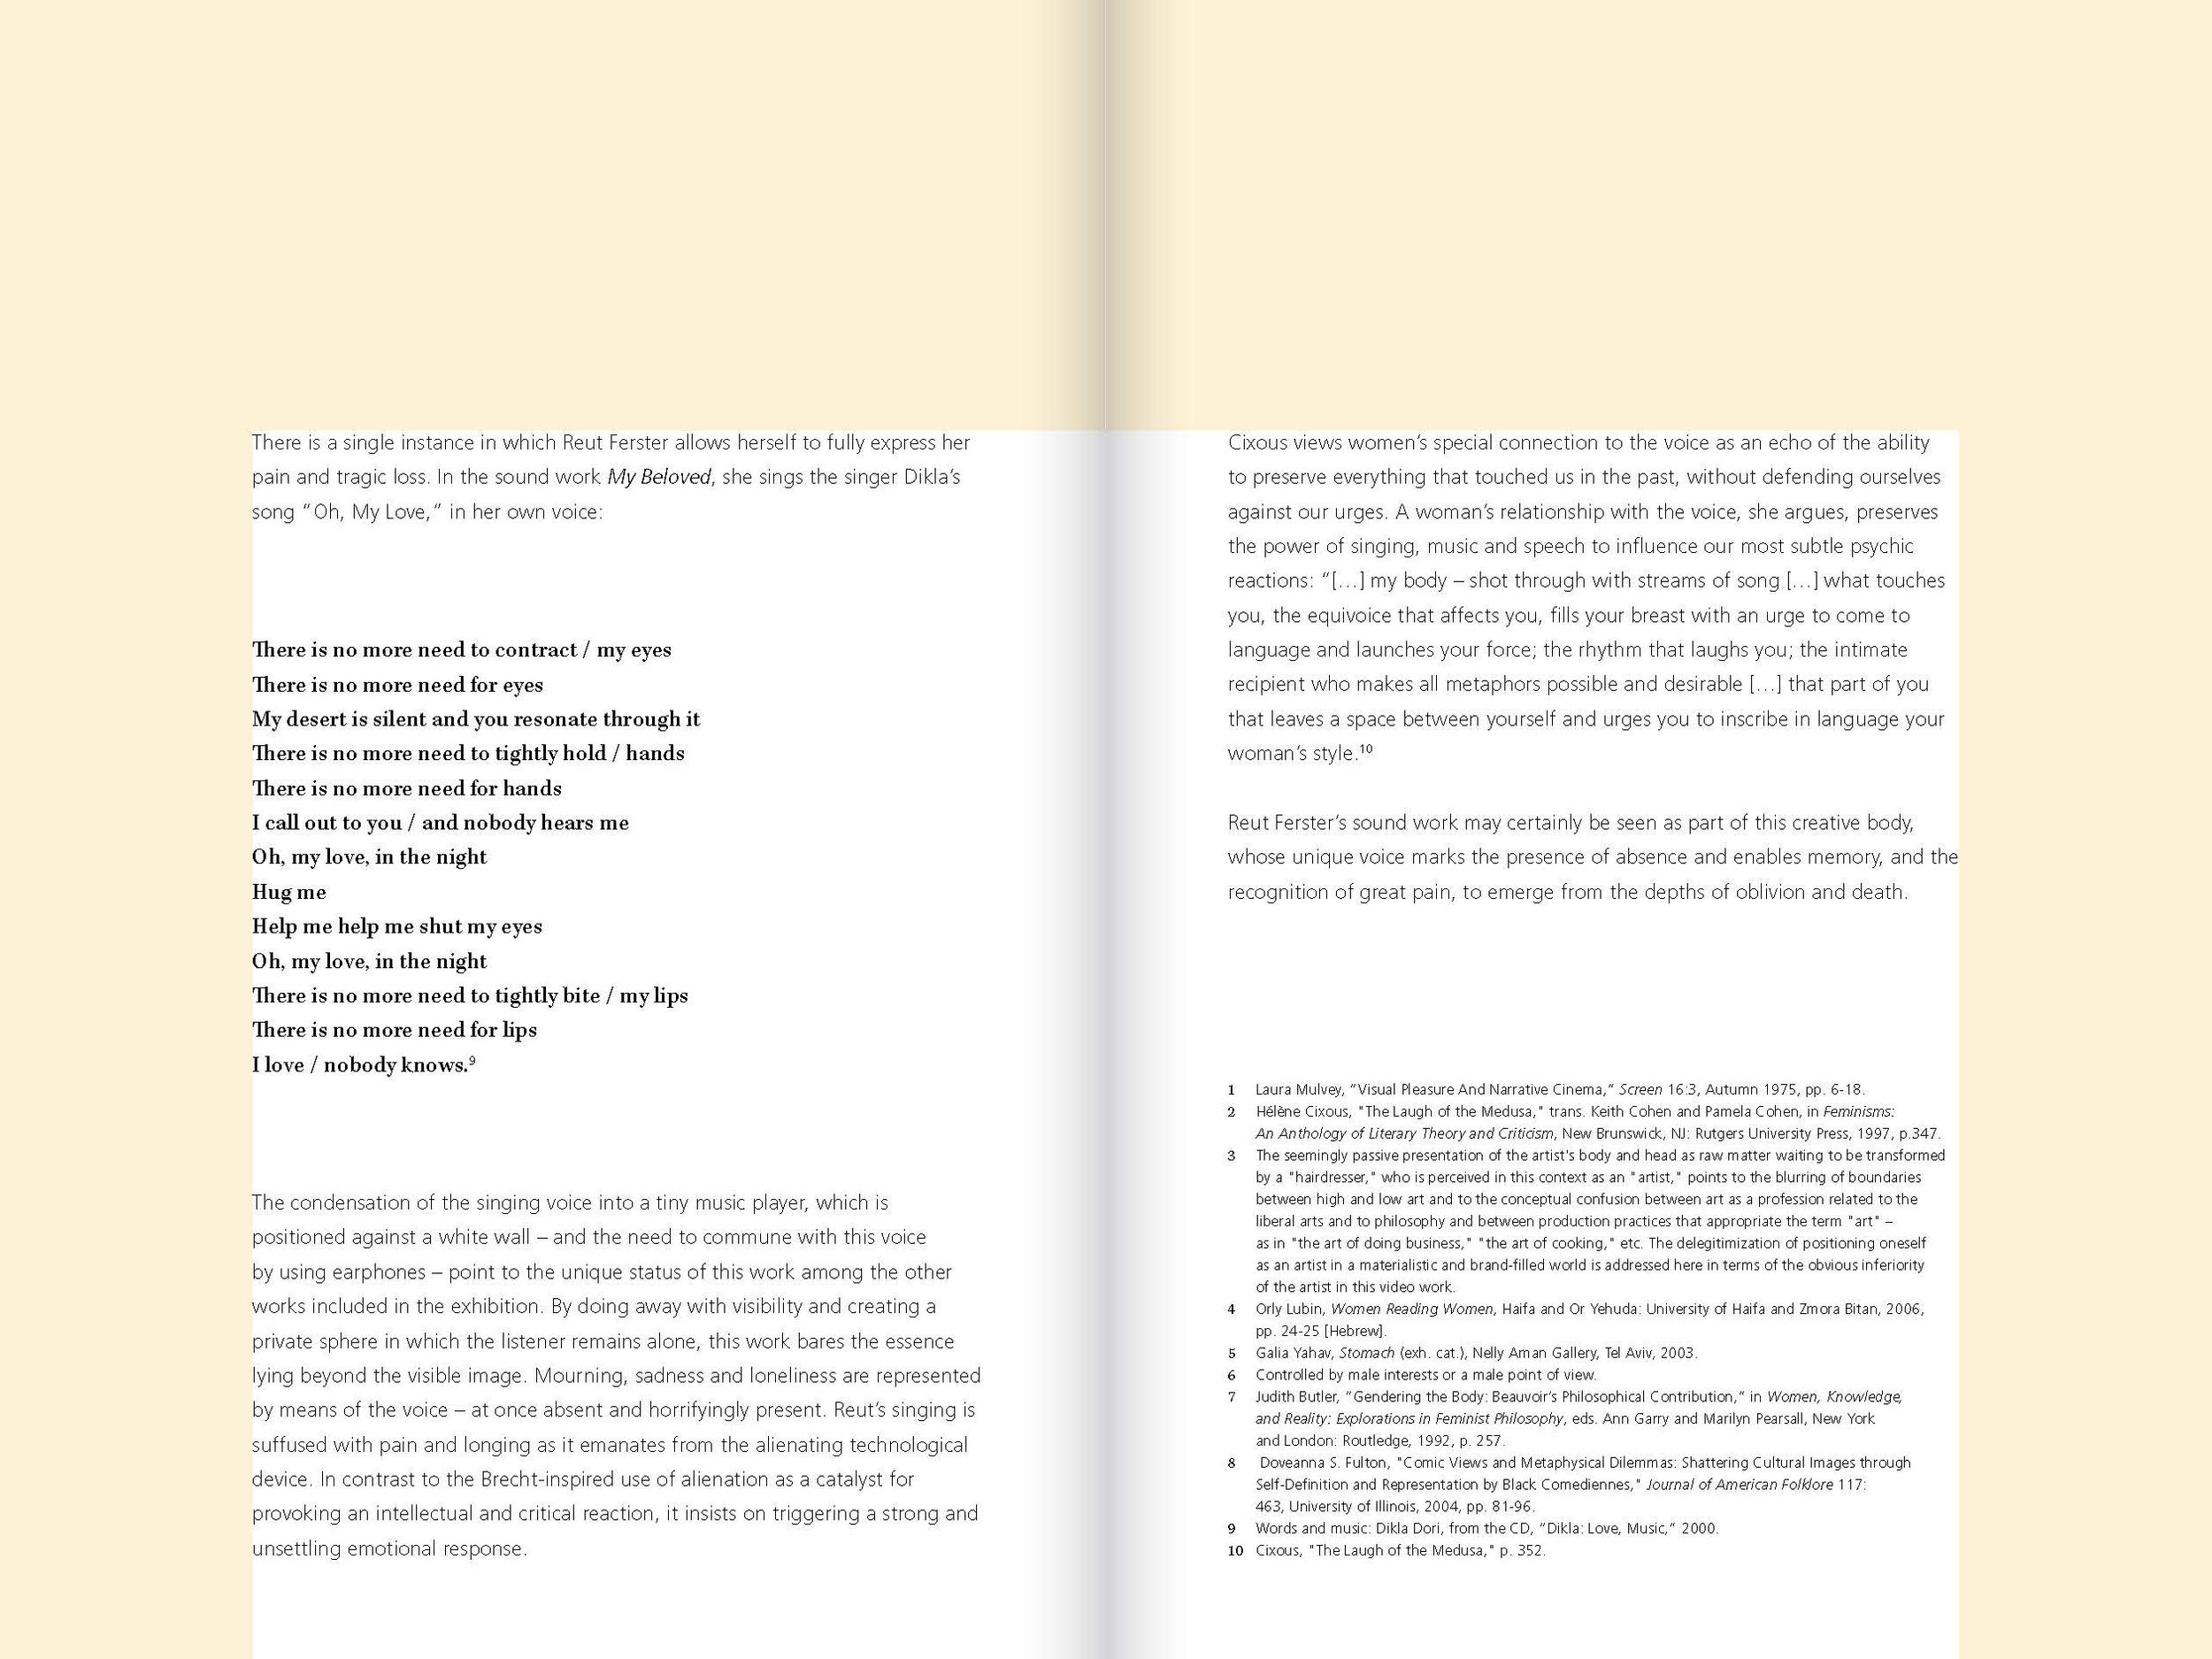 reut_ferster catalouge_Page_10.jpg